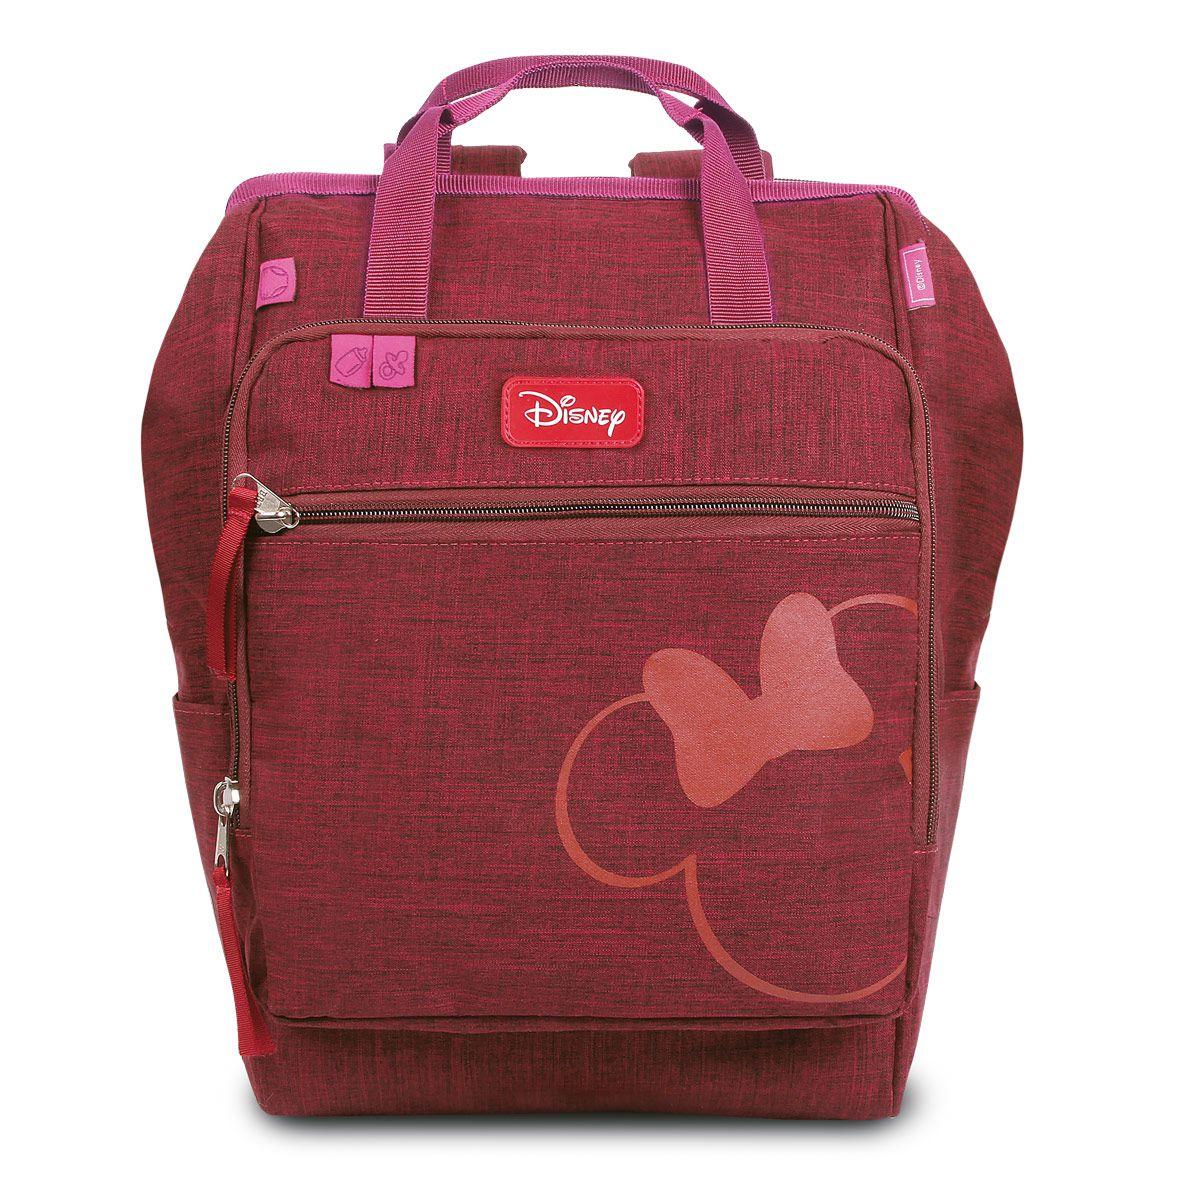 Baby Bag G Mochila Térmica Maternidade Minnie c/ Trocador Disney